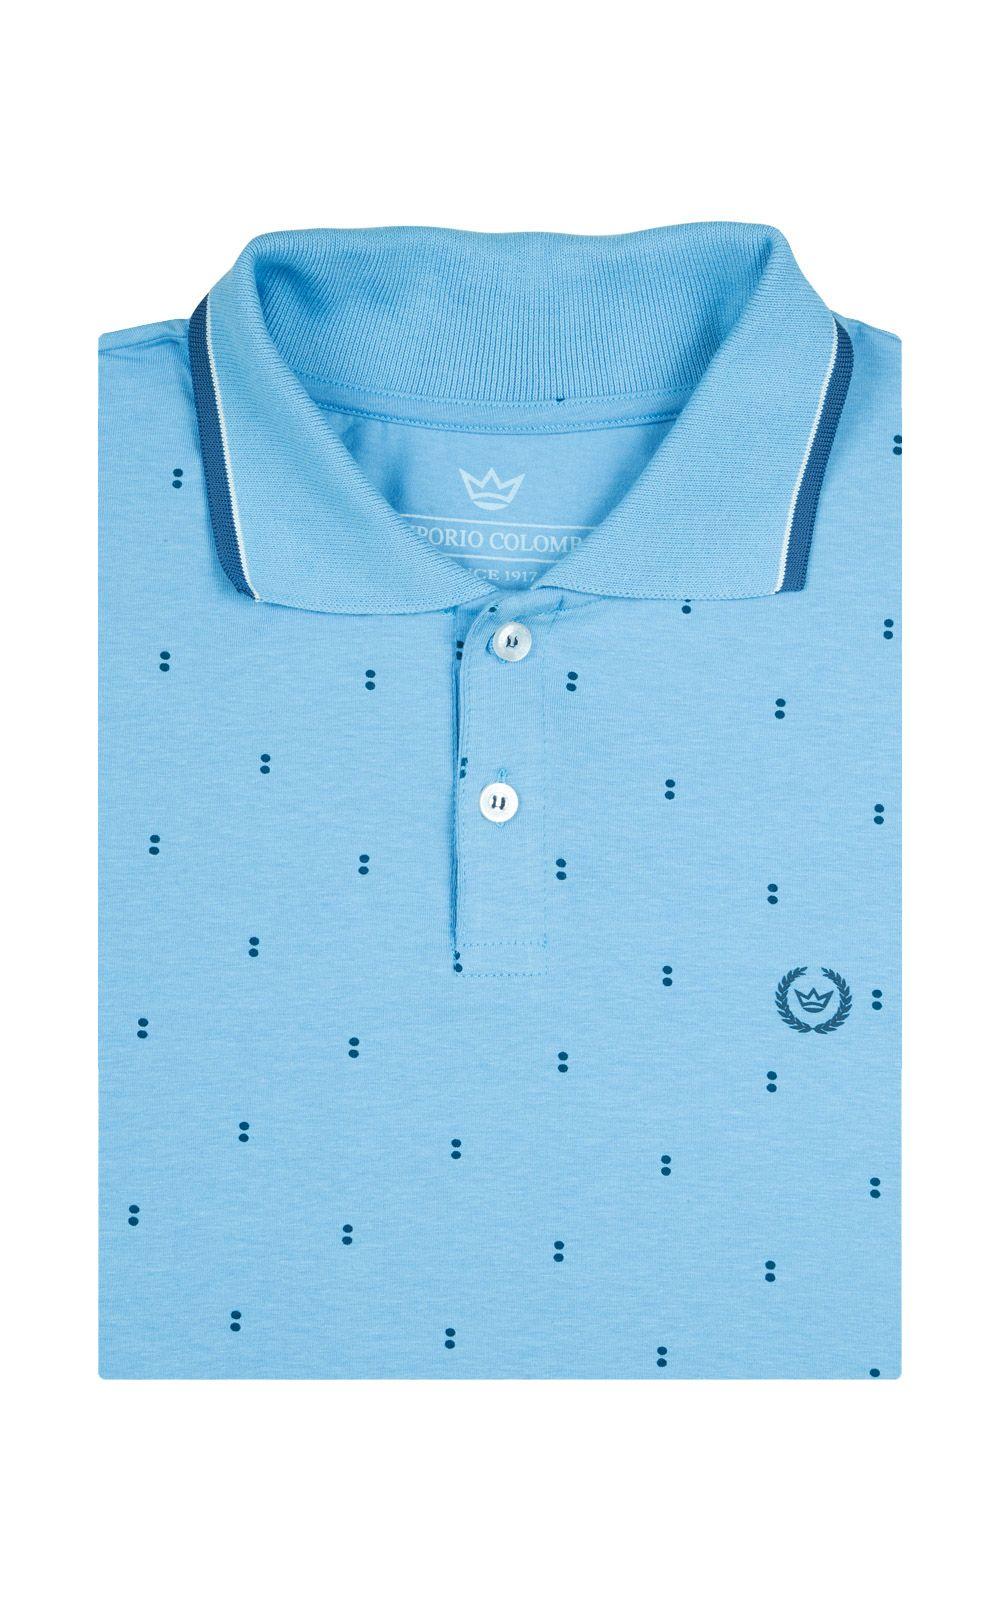 Foto 4 - Camisa Polo Masculina Azul Claro Estampada